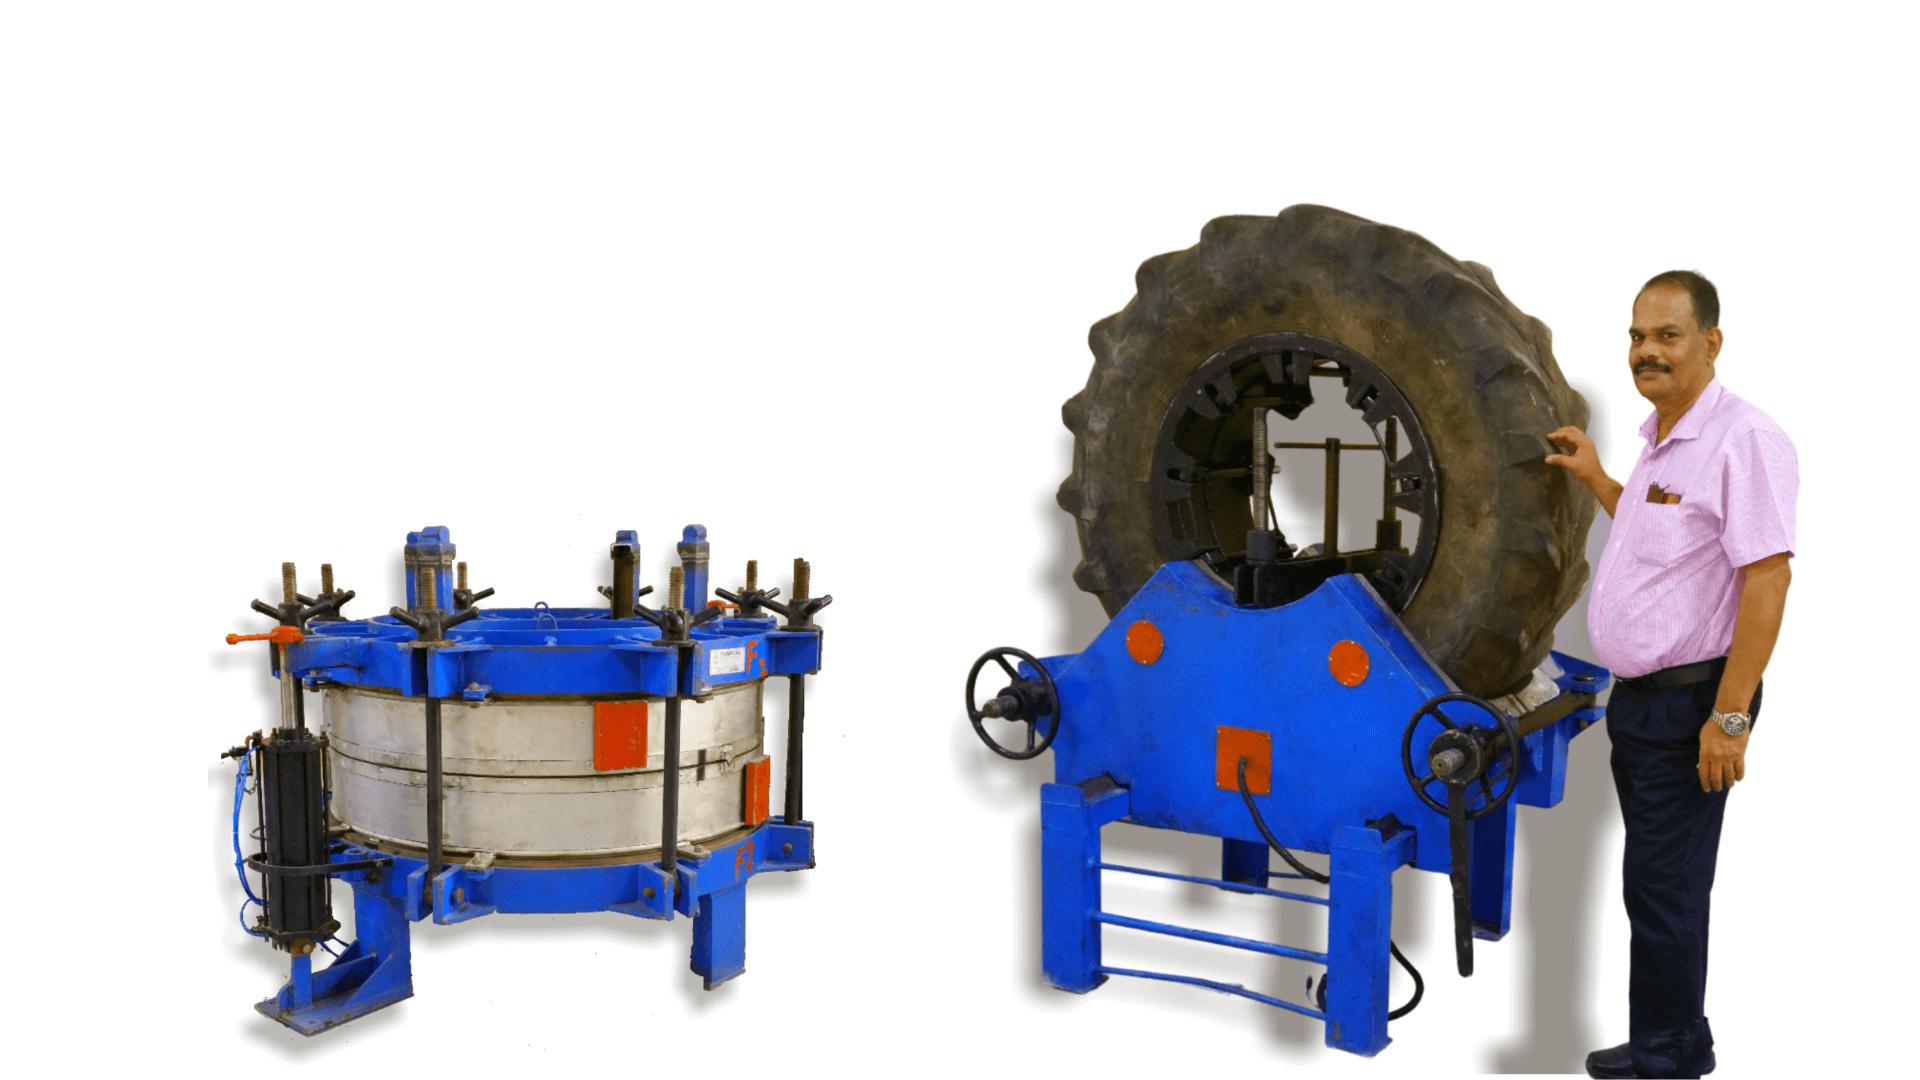 THOMPSON'S – ELECTRIC TYRE RETREADING MACHINE